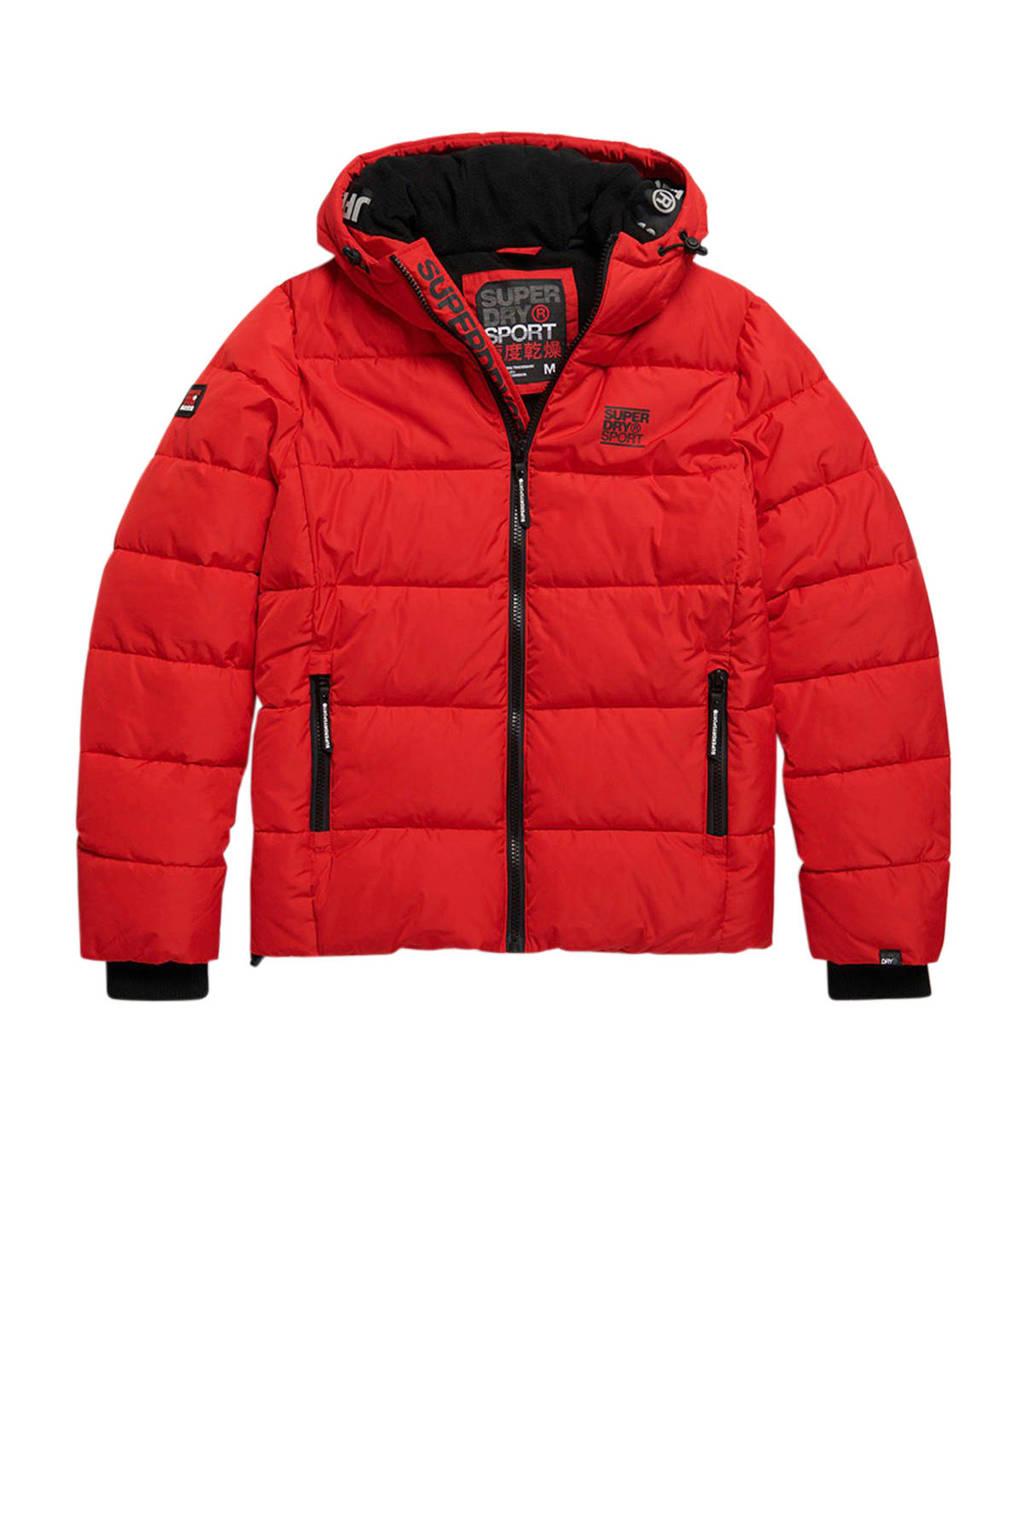 Superdry Sport winterjas rood, Rood